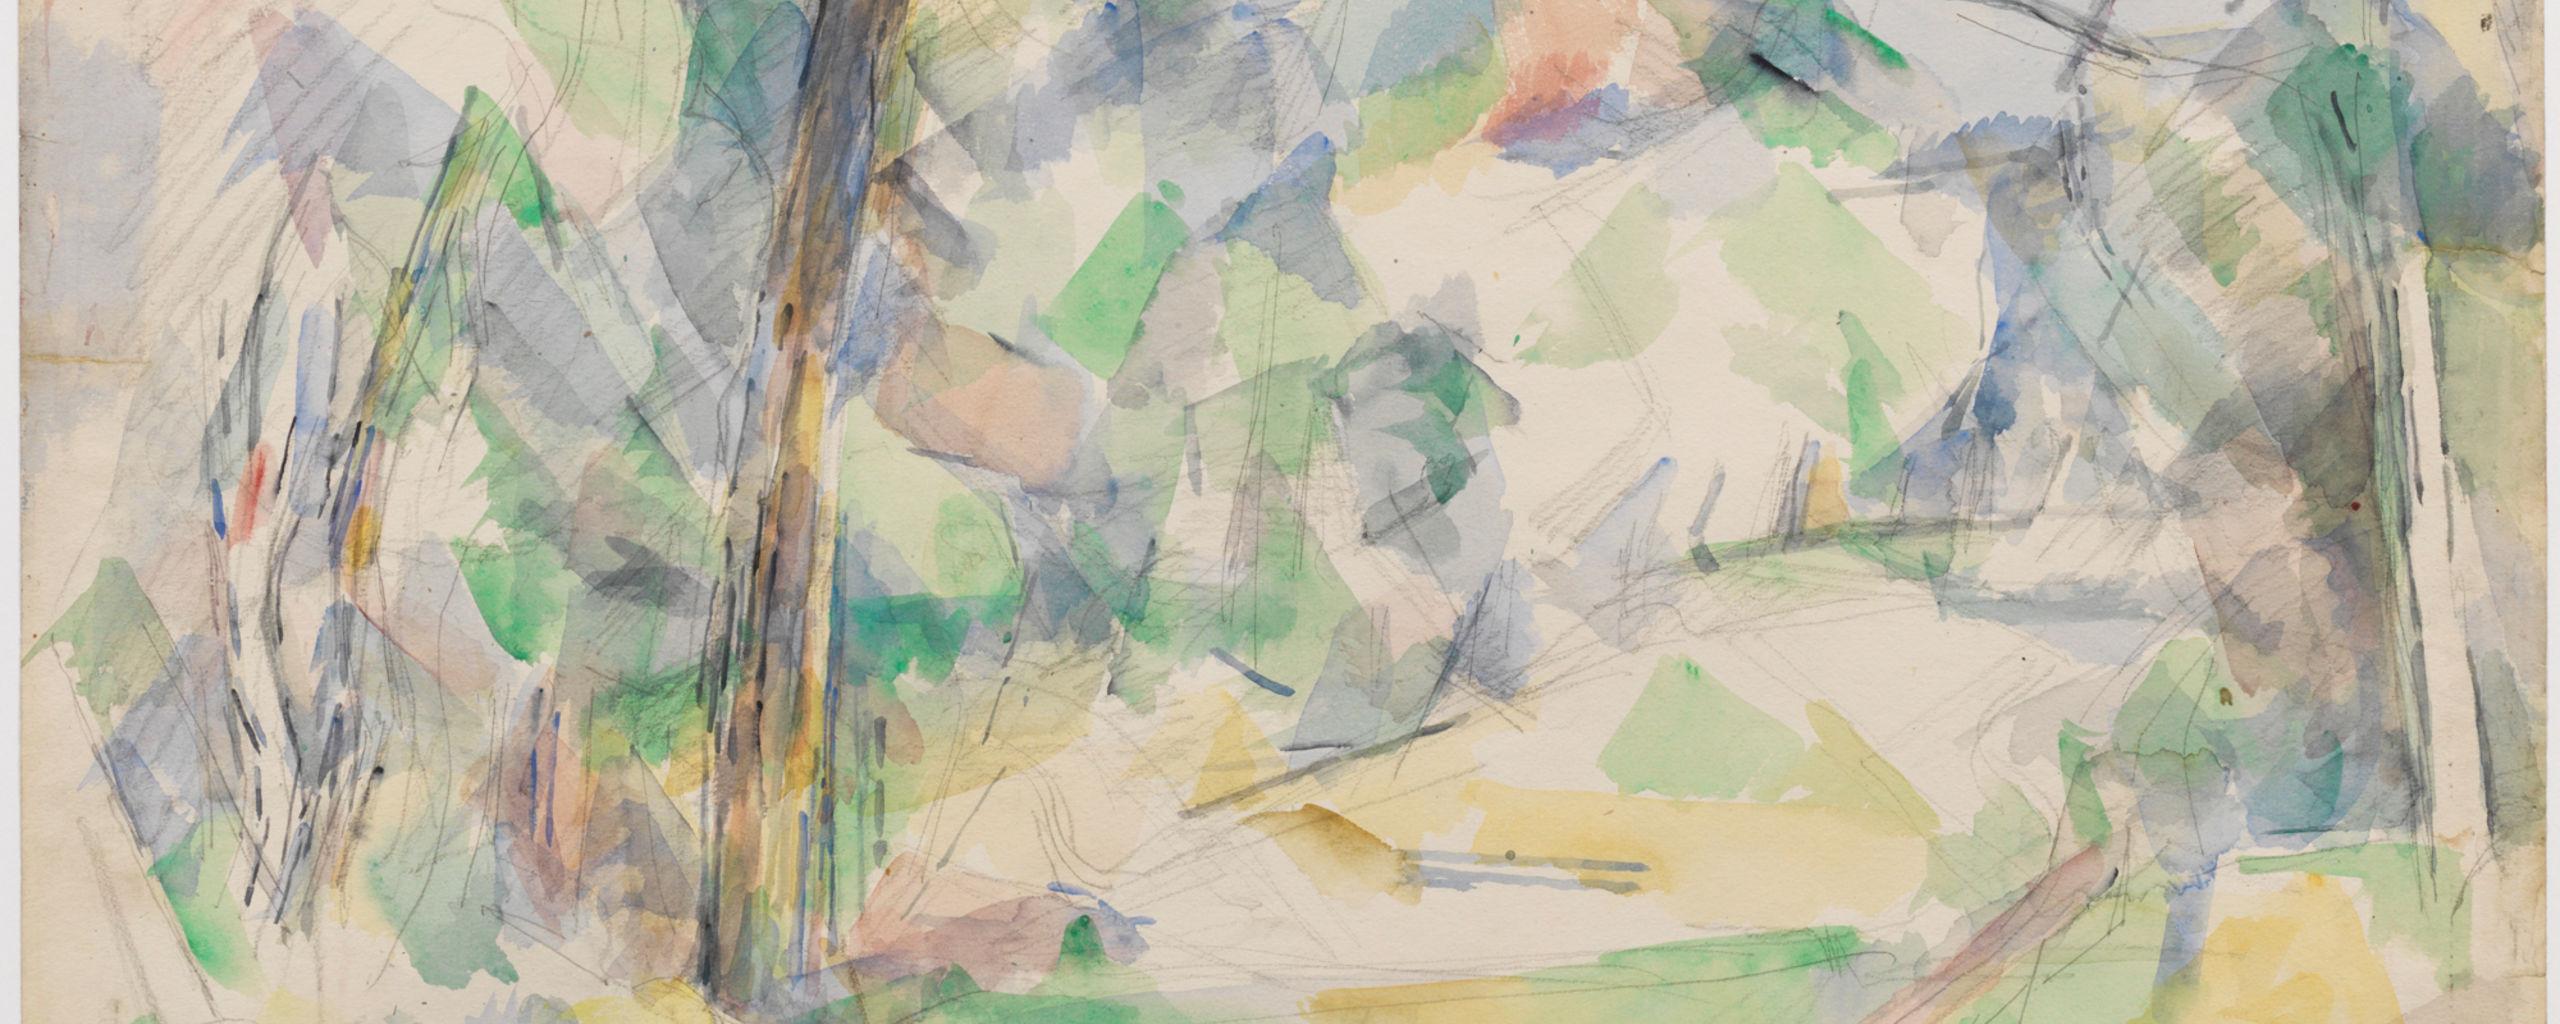 http://artmuseum.princeton.edu/files/styles/puam_hero_2560/public/_carousel_images/l1988-62-46.jpg?itok=Fb3ULWXT&timestamp=1517414429